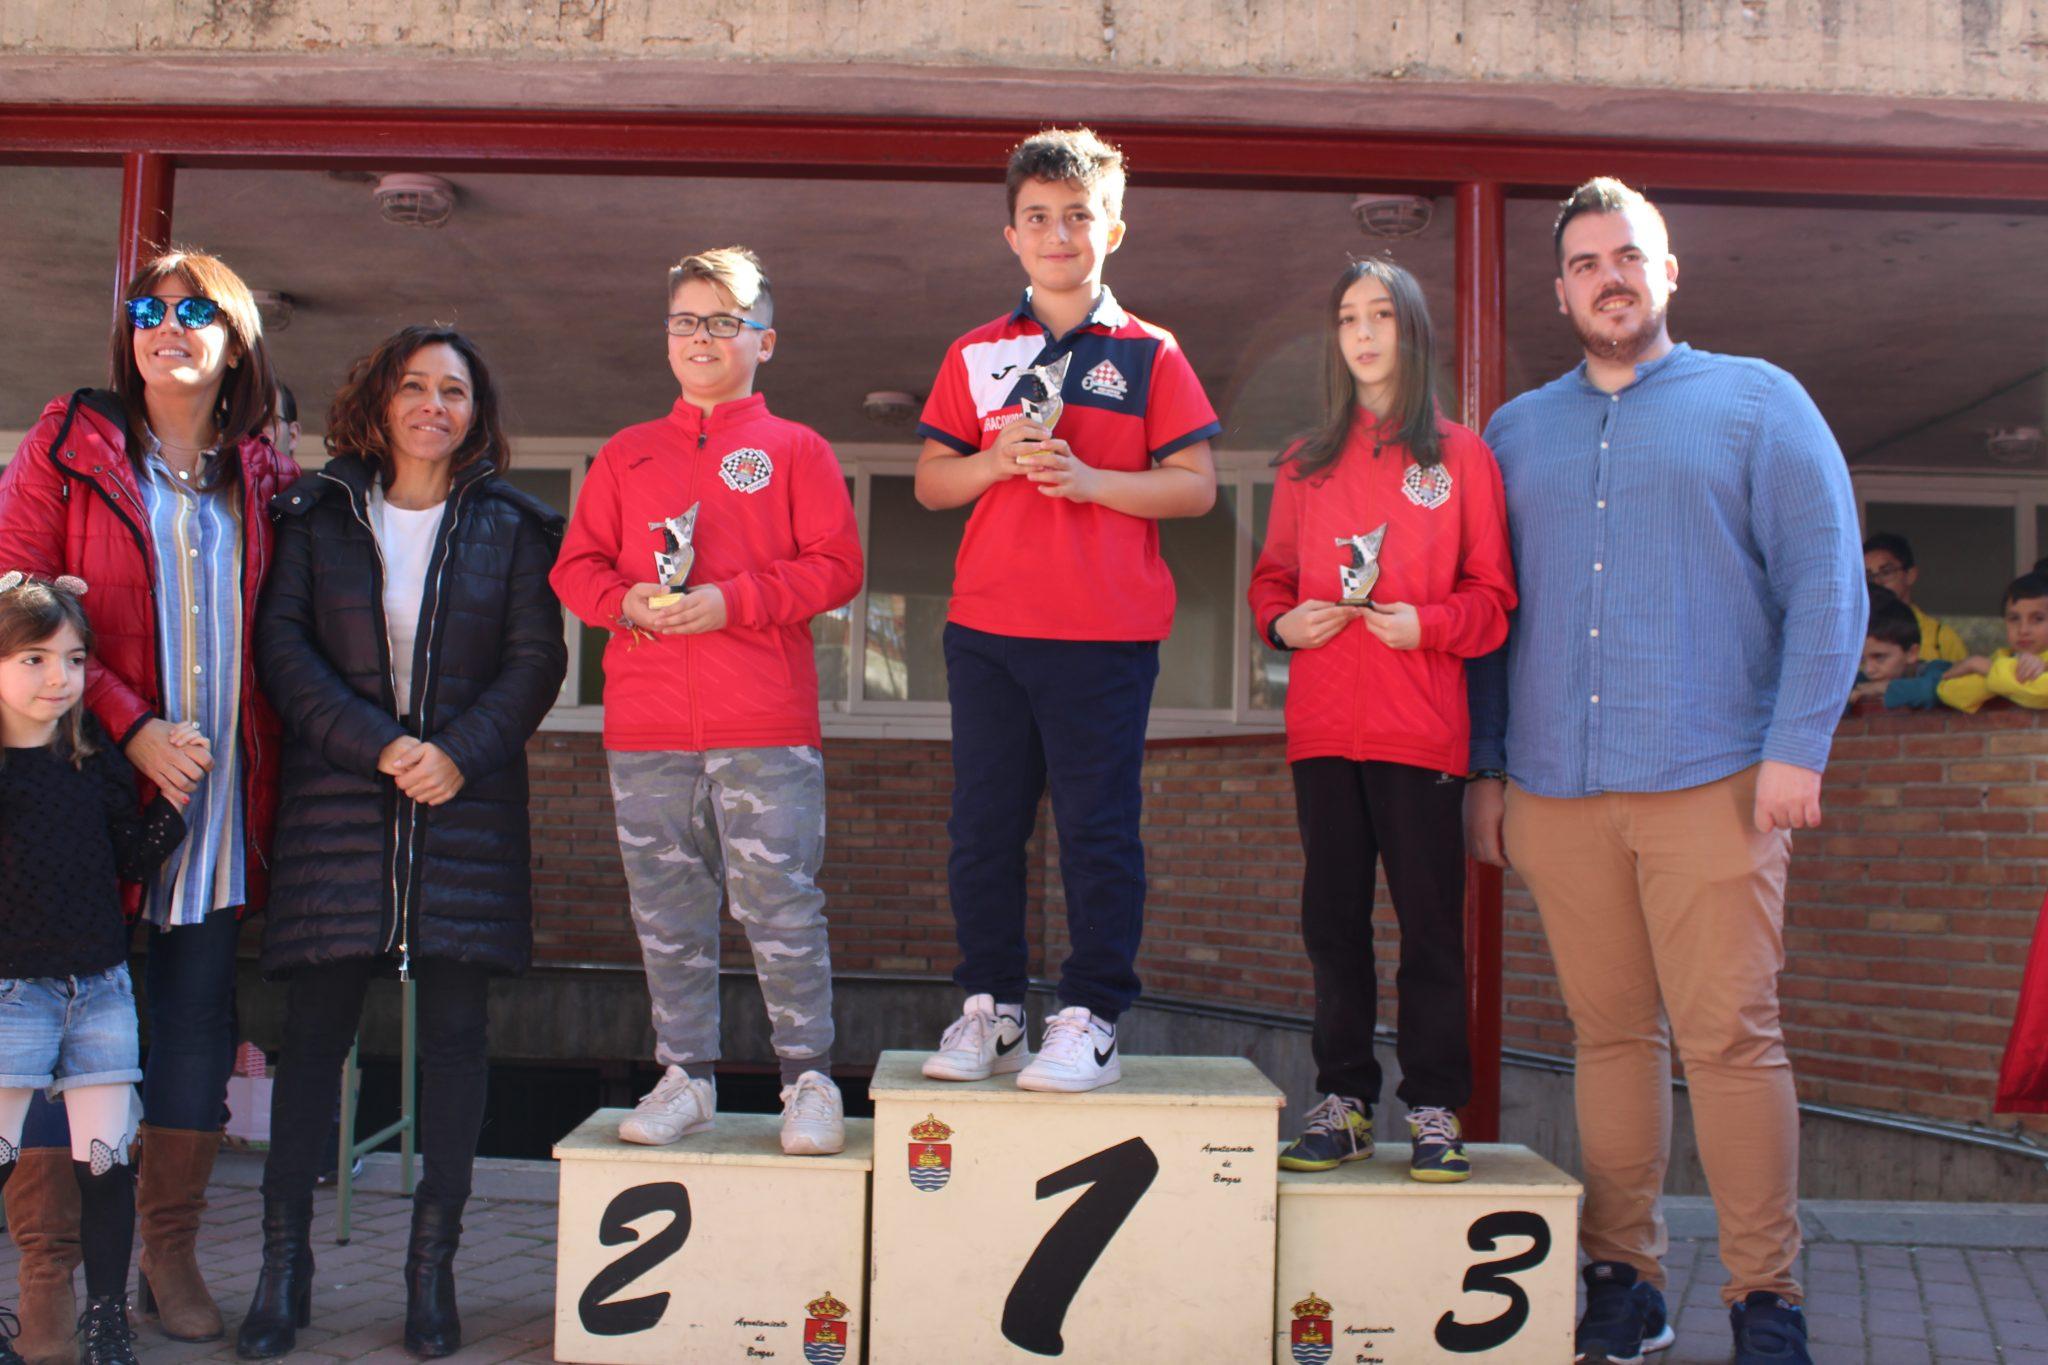 8. Pablo y Dante podiums sub-12 M